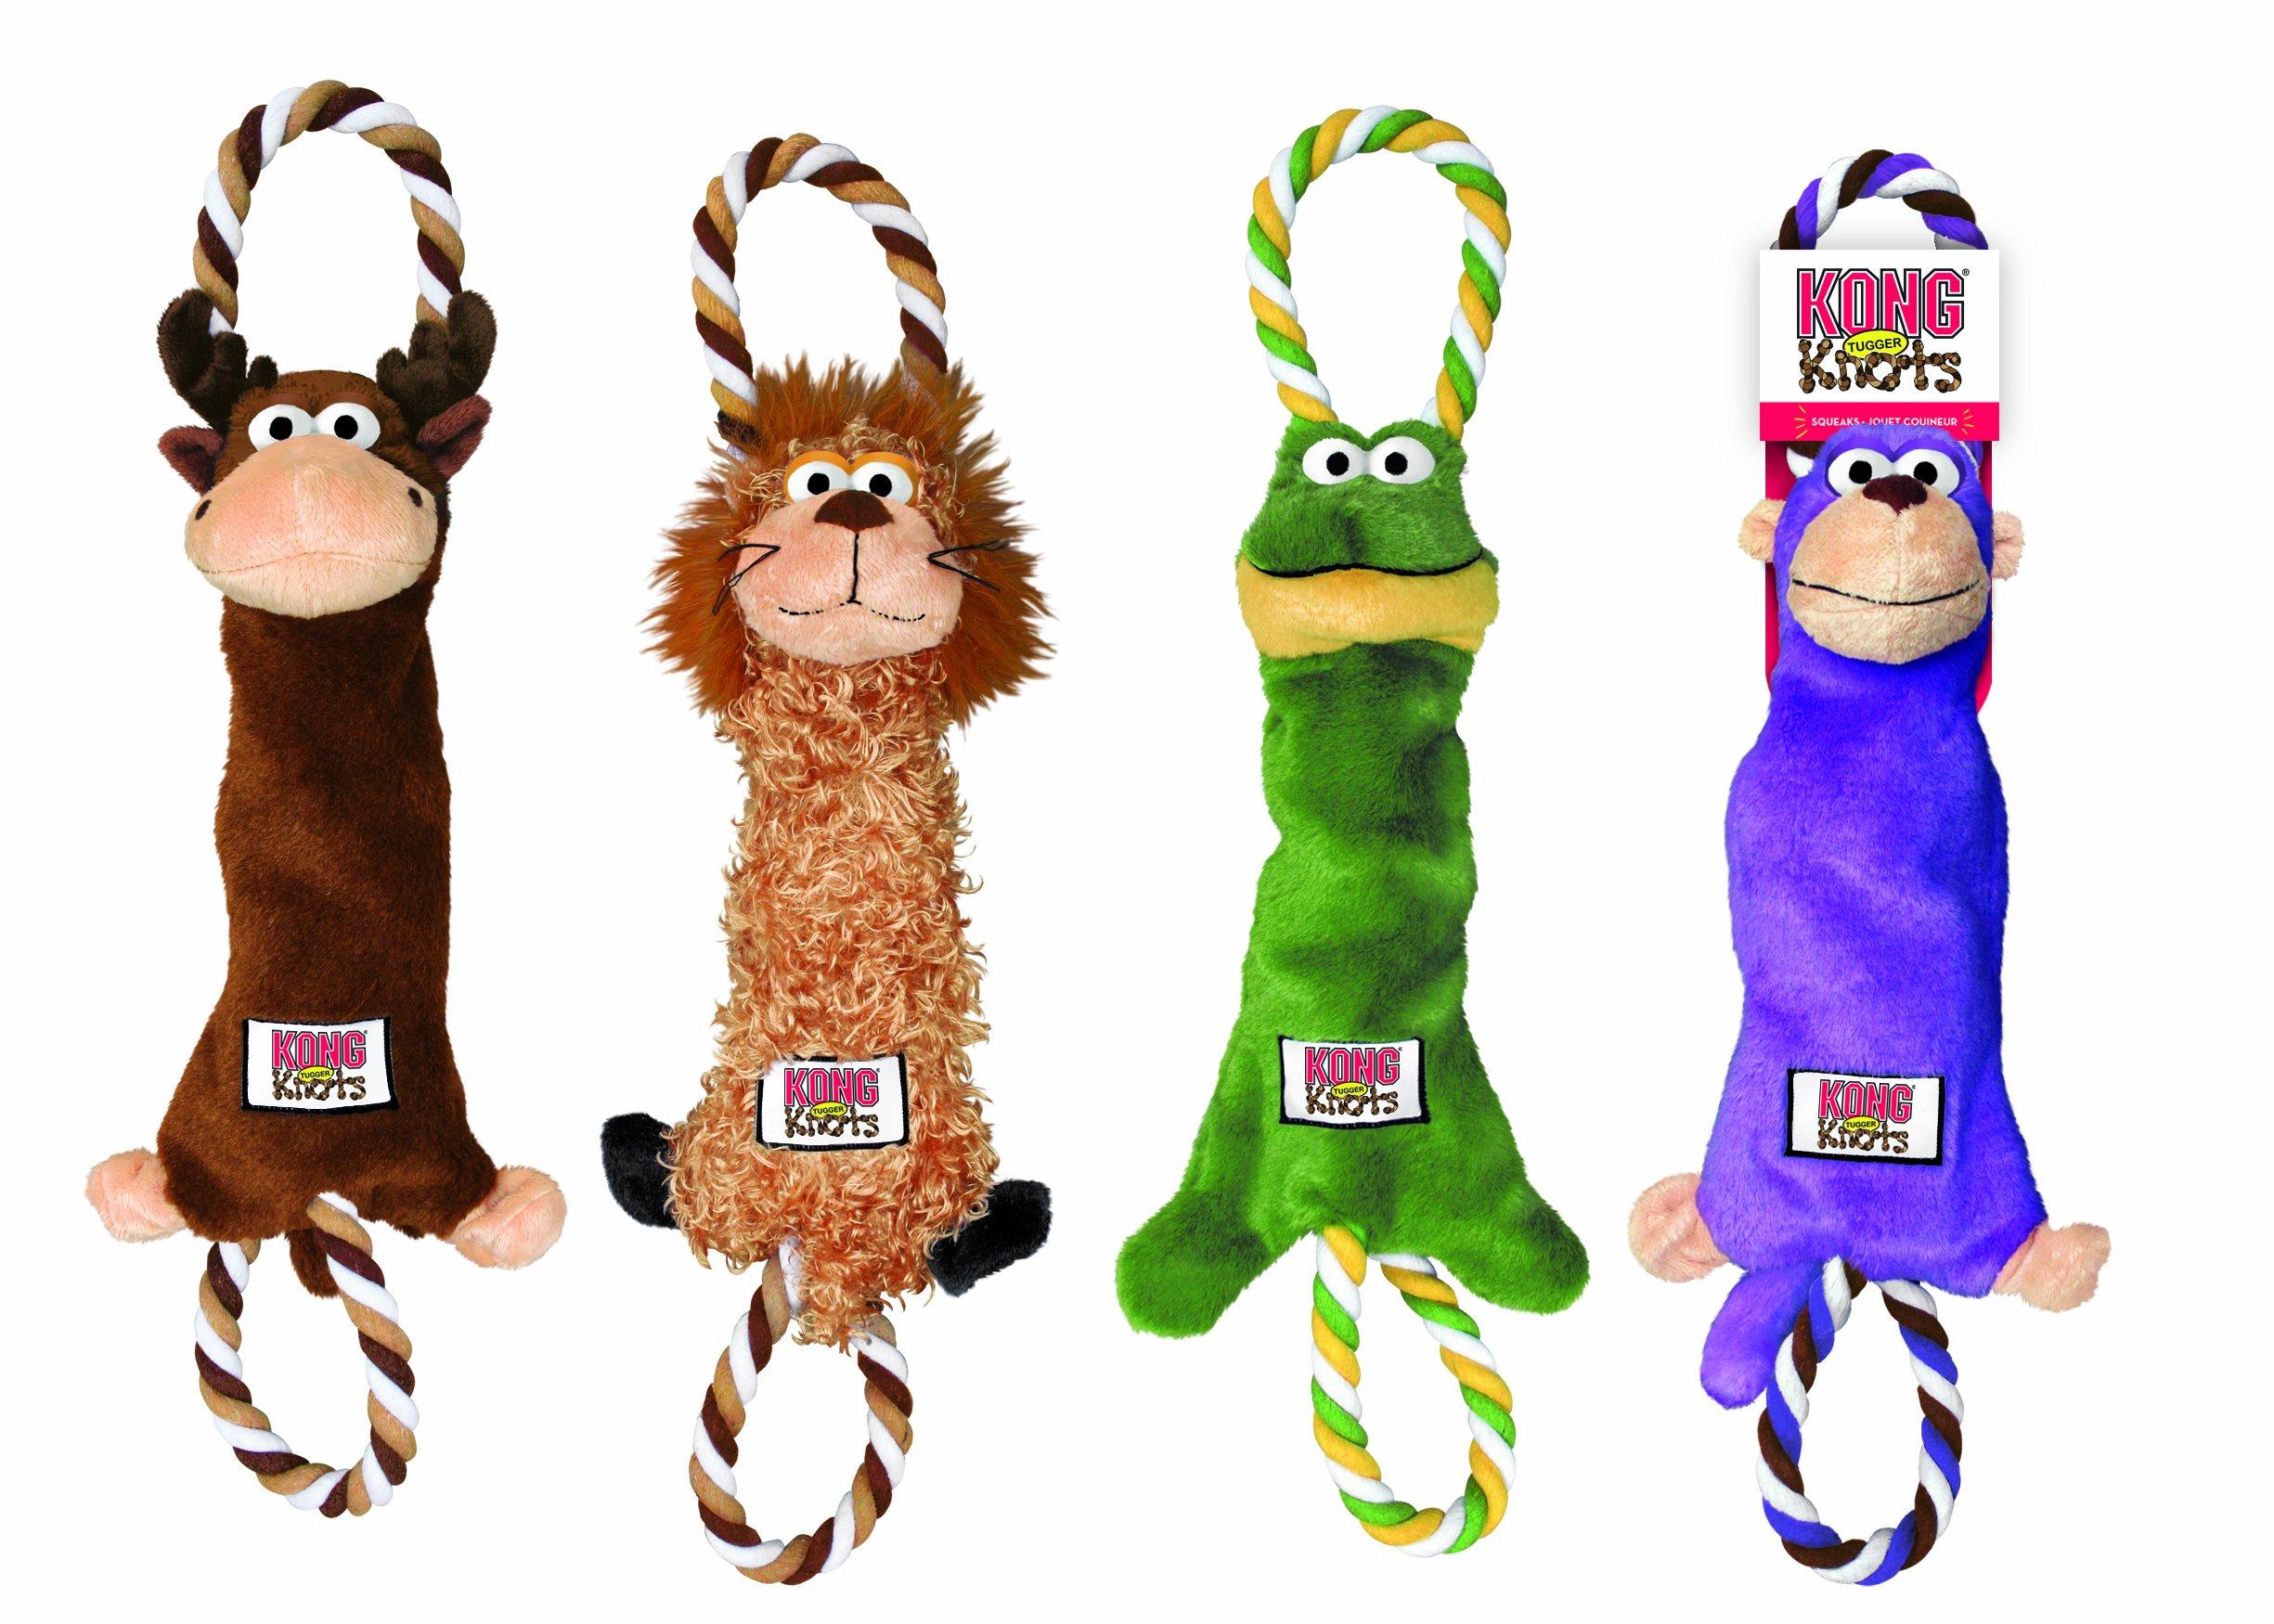 KONG Tugger Knots Moose Dog Toy, Small/Medium